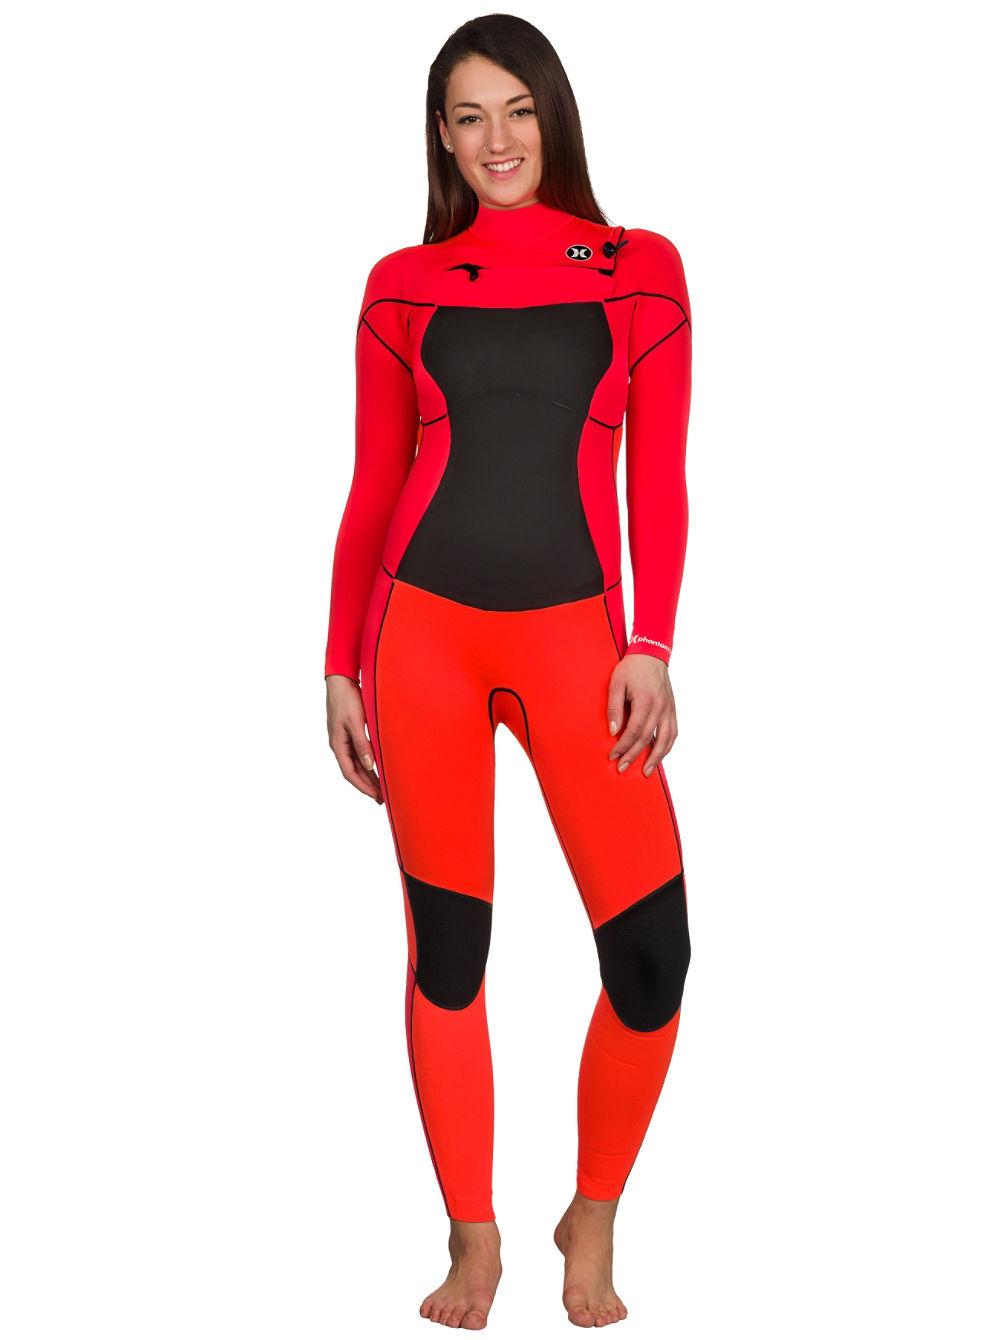 Buy Hurley Phantom 202 Full Wetsuit online at blue-tomato.com f991737a3